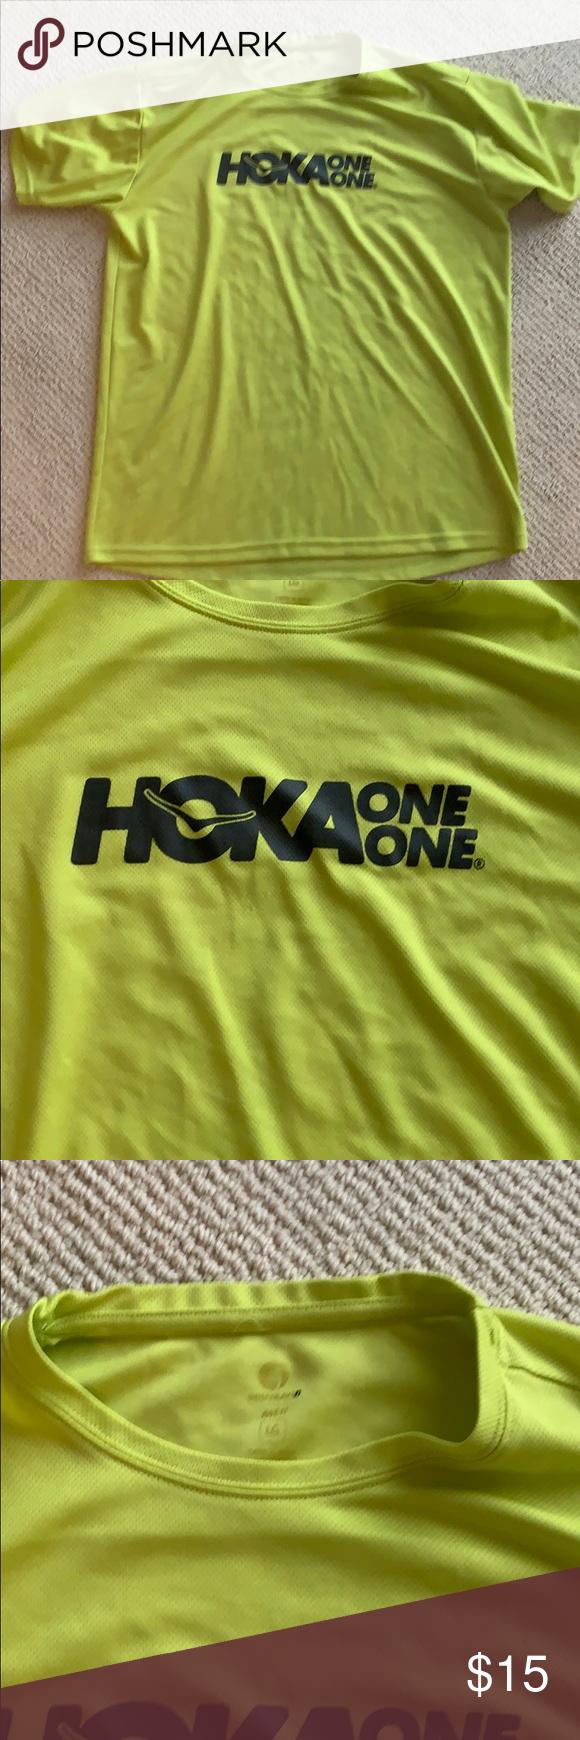 Hola t shirt | Shirts, Clothes design